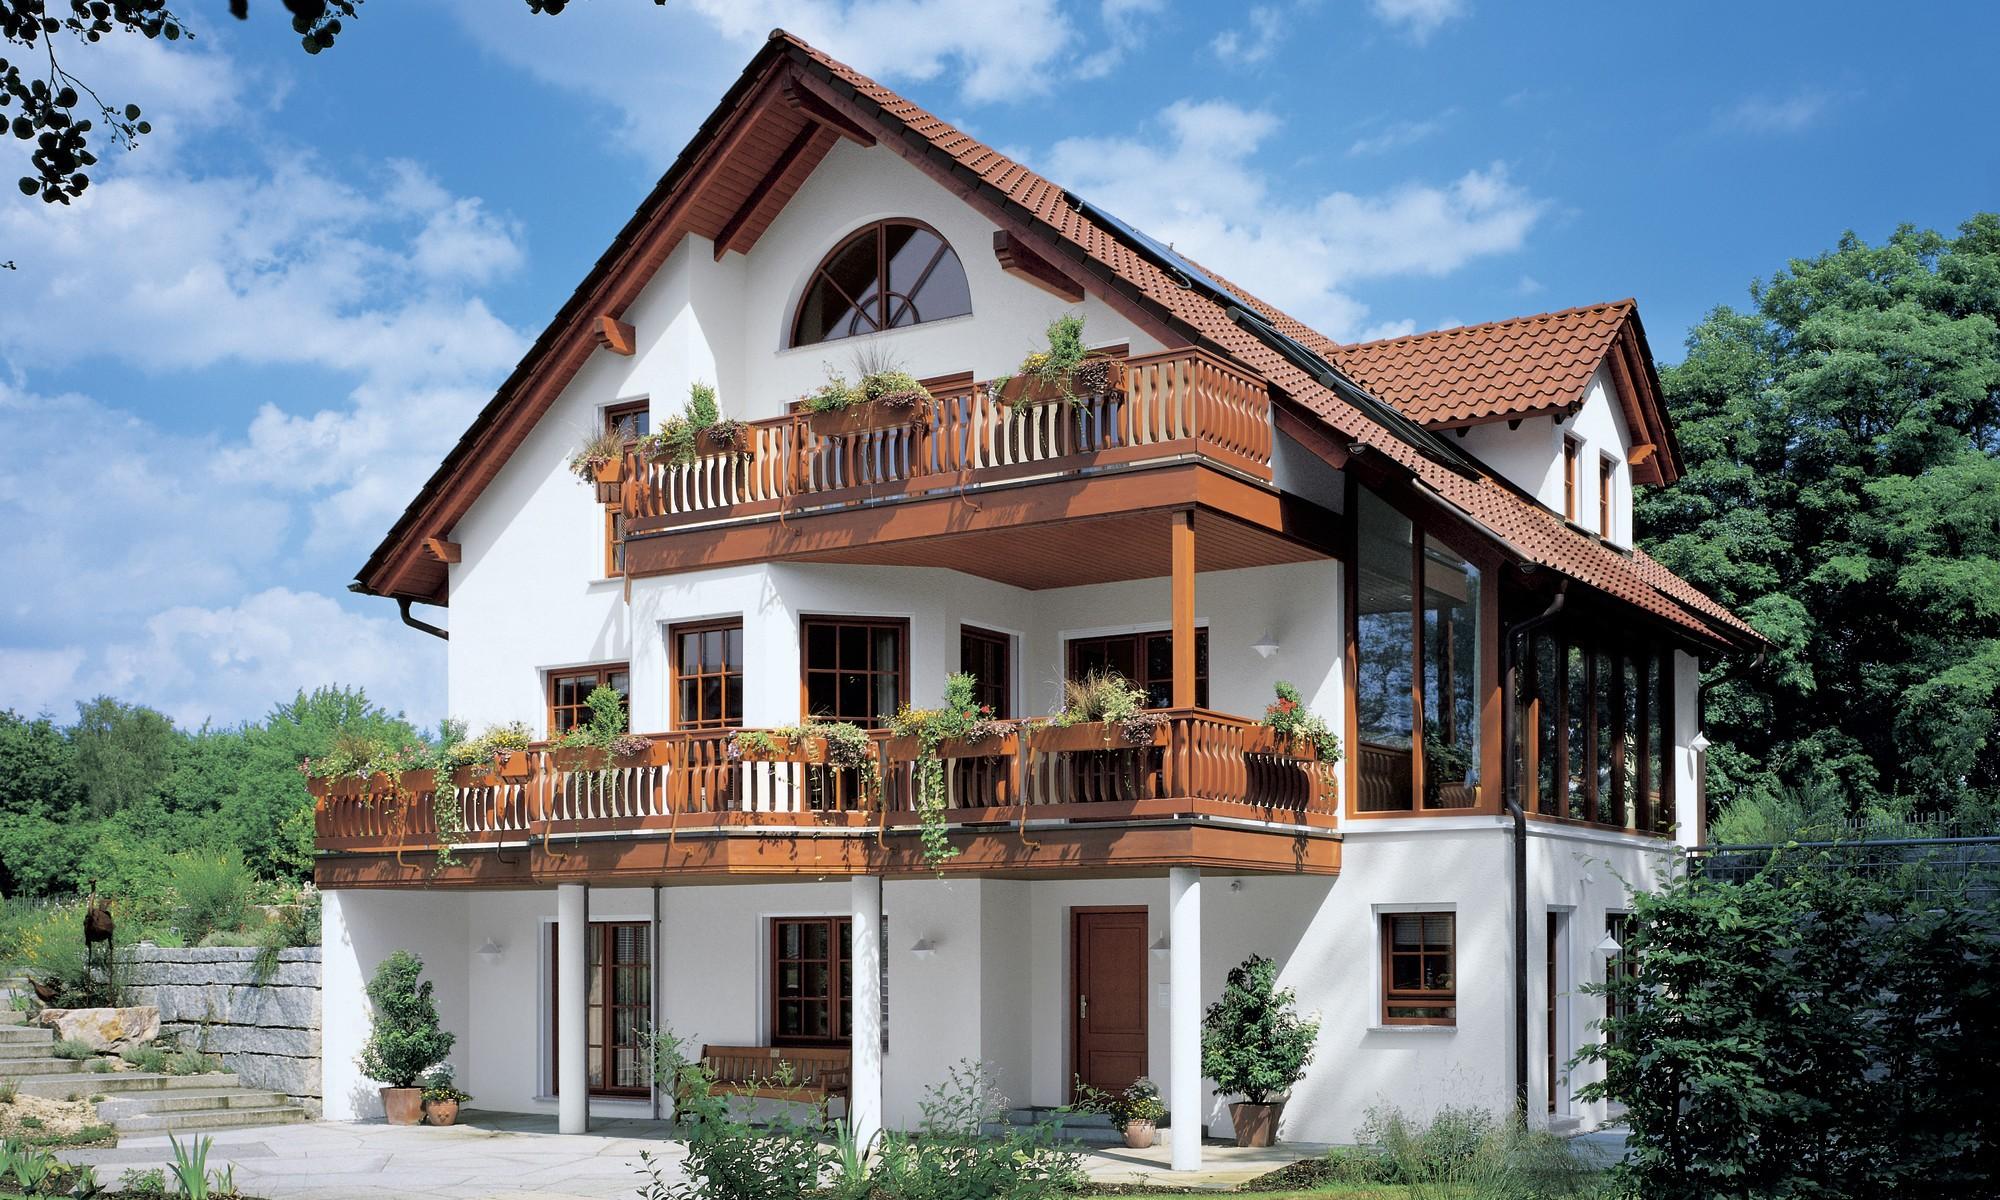 Klassischer Landhauscharakter